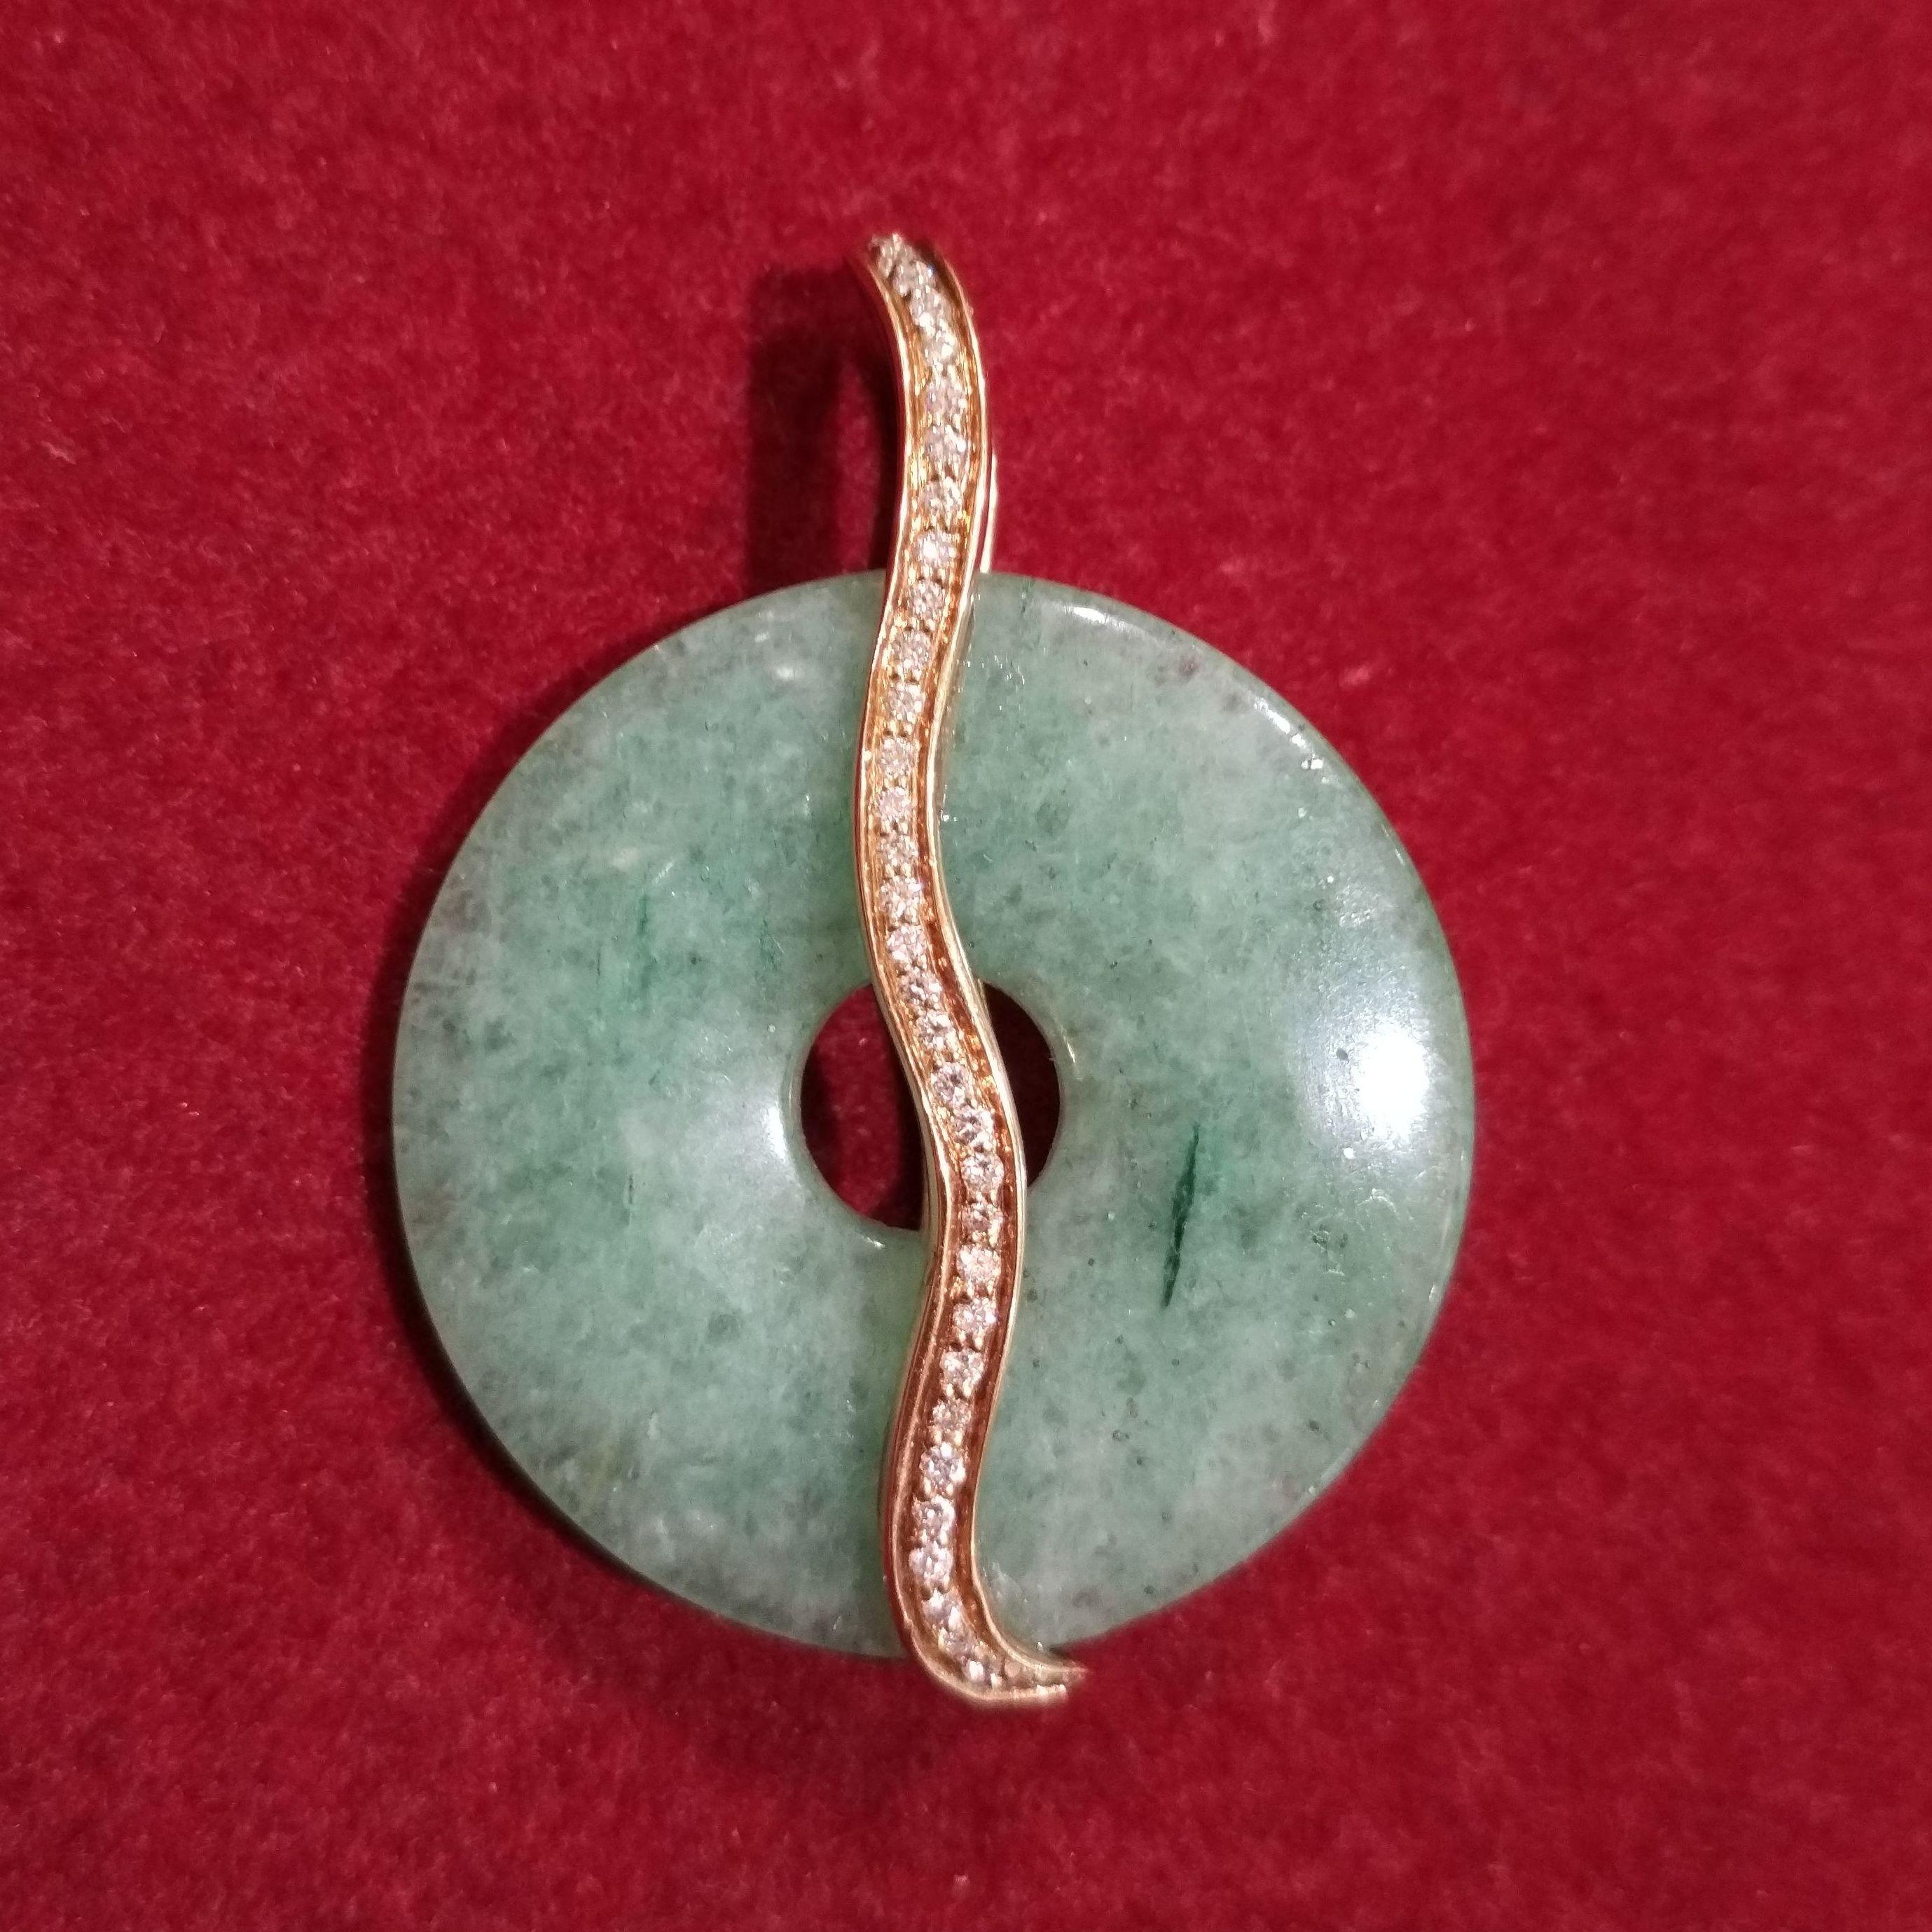 Colgante con montura de oro, brillantes y aro de jase. Moderno.: Catálogo de Antigua Joyeros